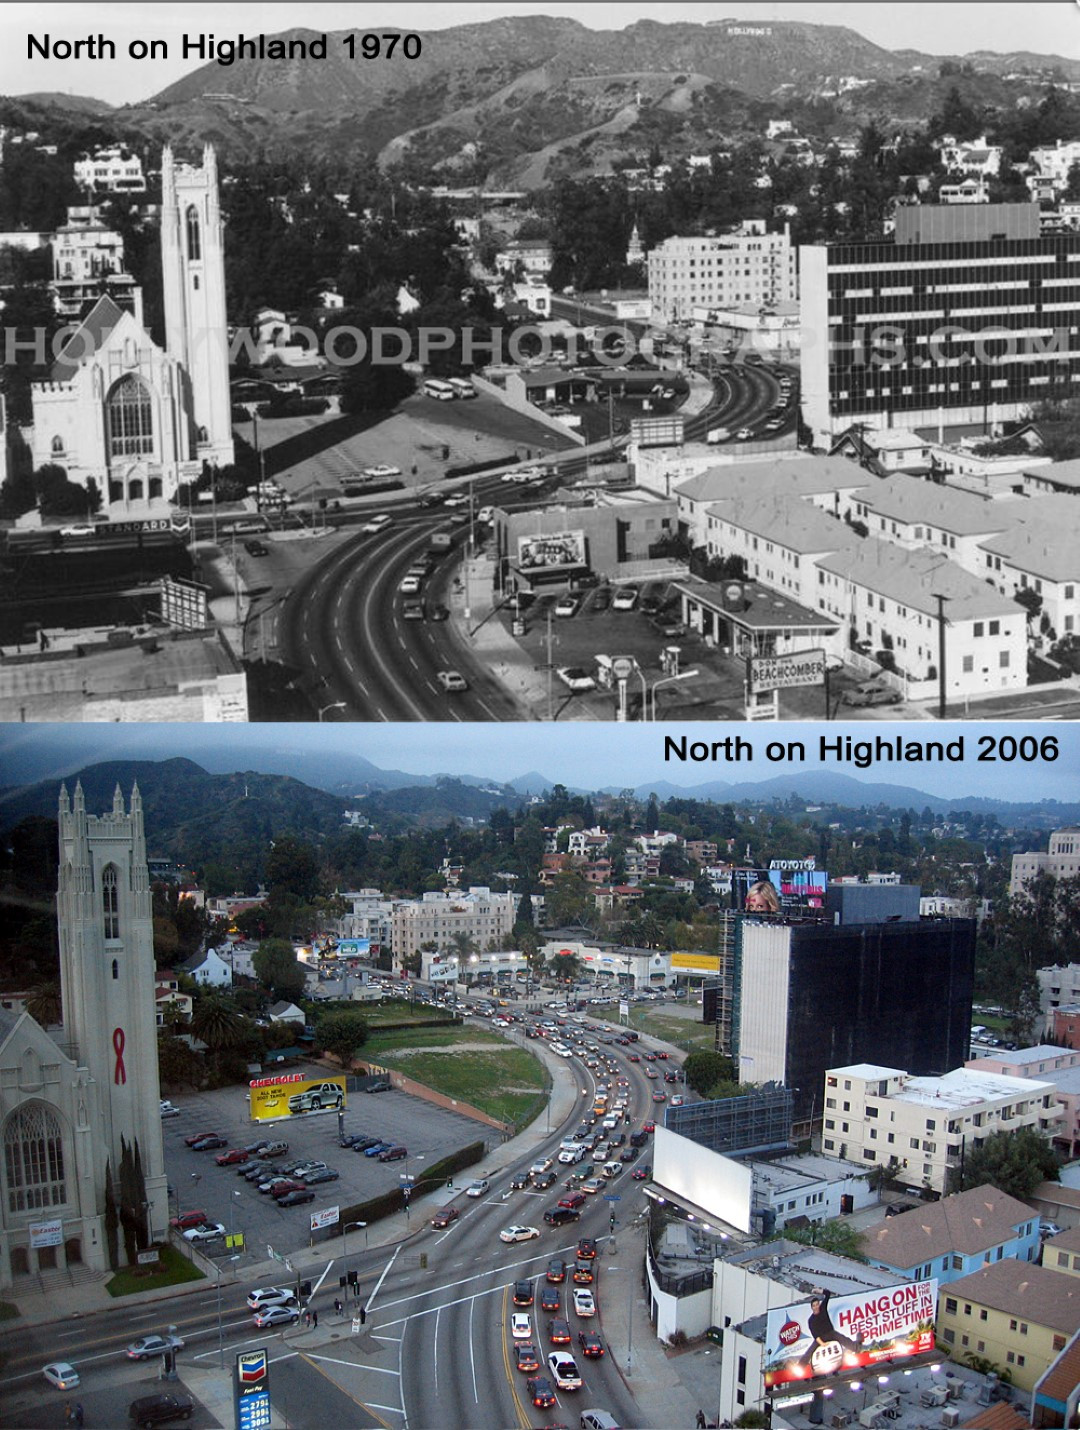 North on Highland 1970 & 2006